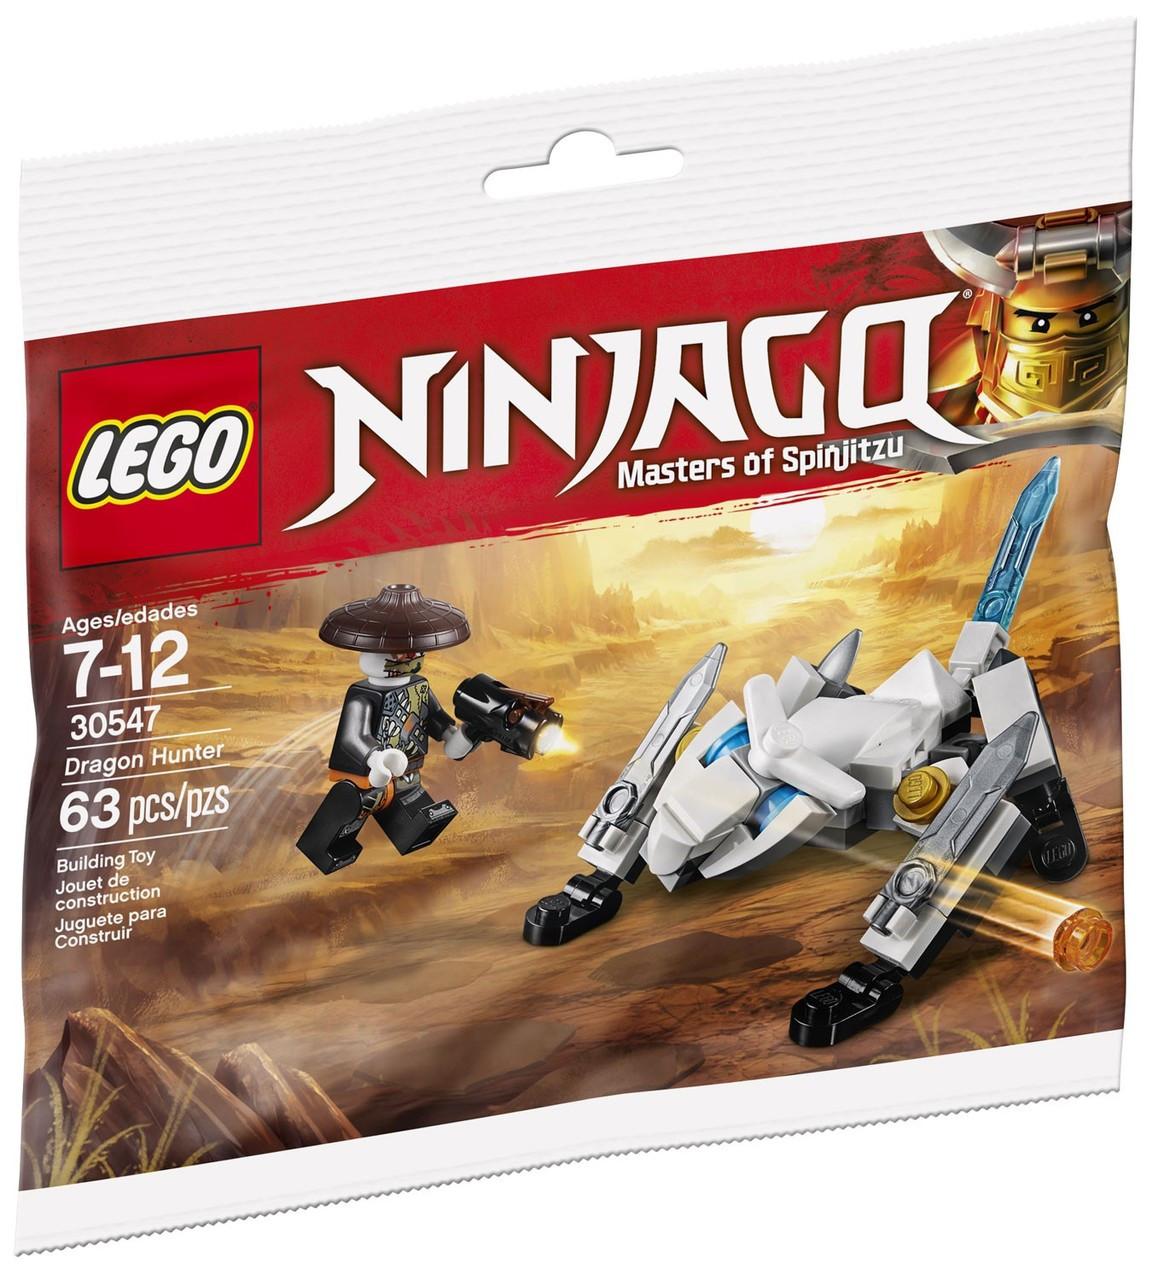 Hunter Lego Lego Dragon Set30547bagged Ninjago lFJcT1K